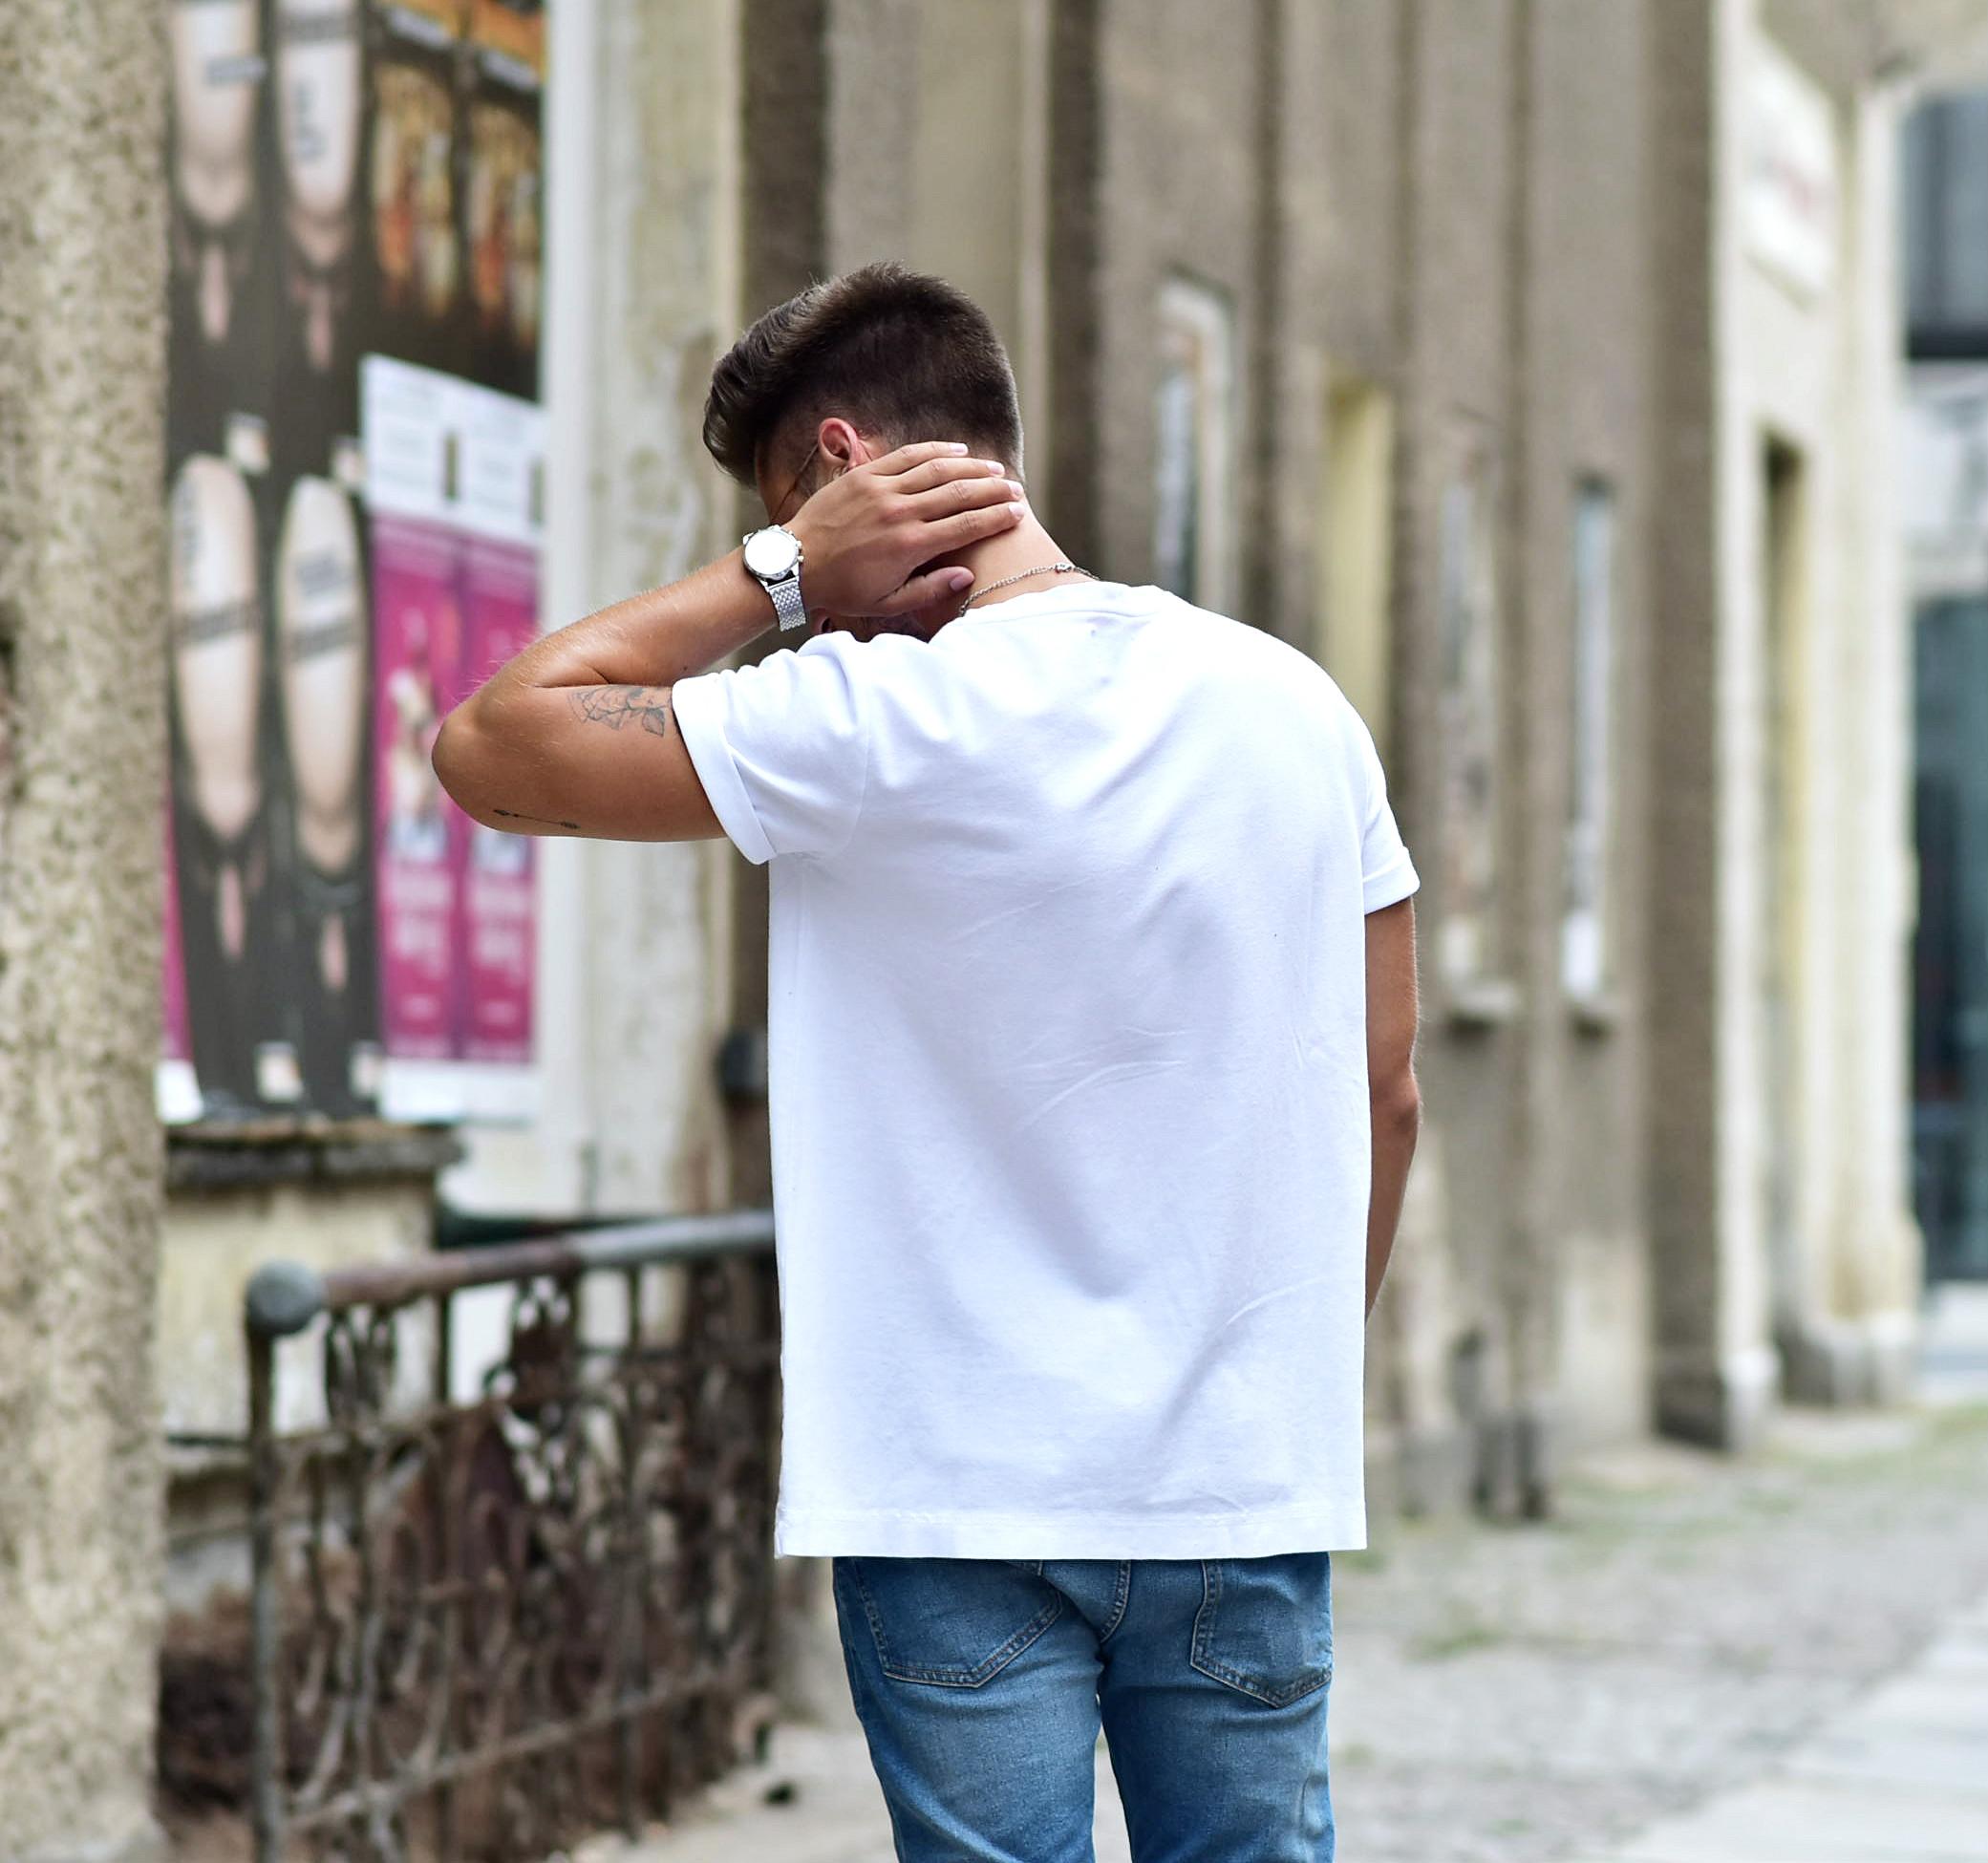 Tommeezjerry-Styleblog-Männerblog-Männer-Modeblog-Berlin-Berlinblog-Männermodeblog-Outfit-Adidas-Stan-Smit-h-Casual-Look-Triwa-1